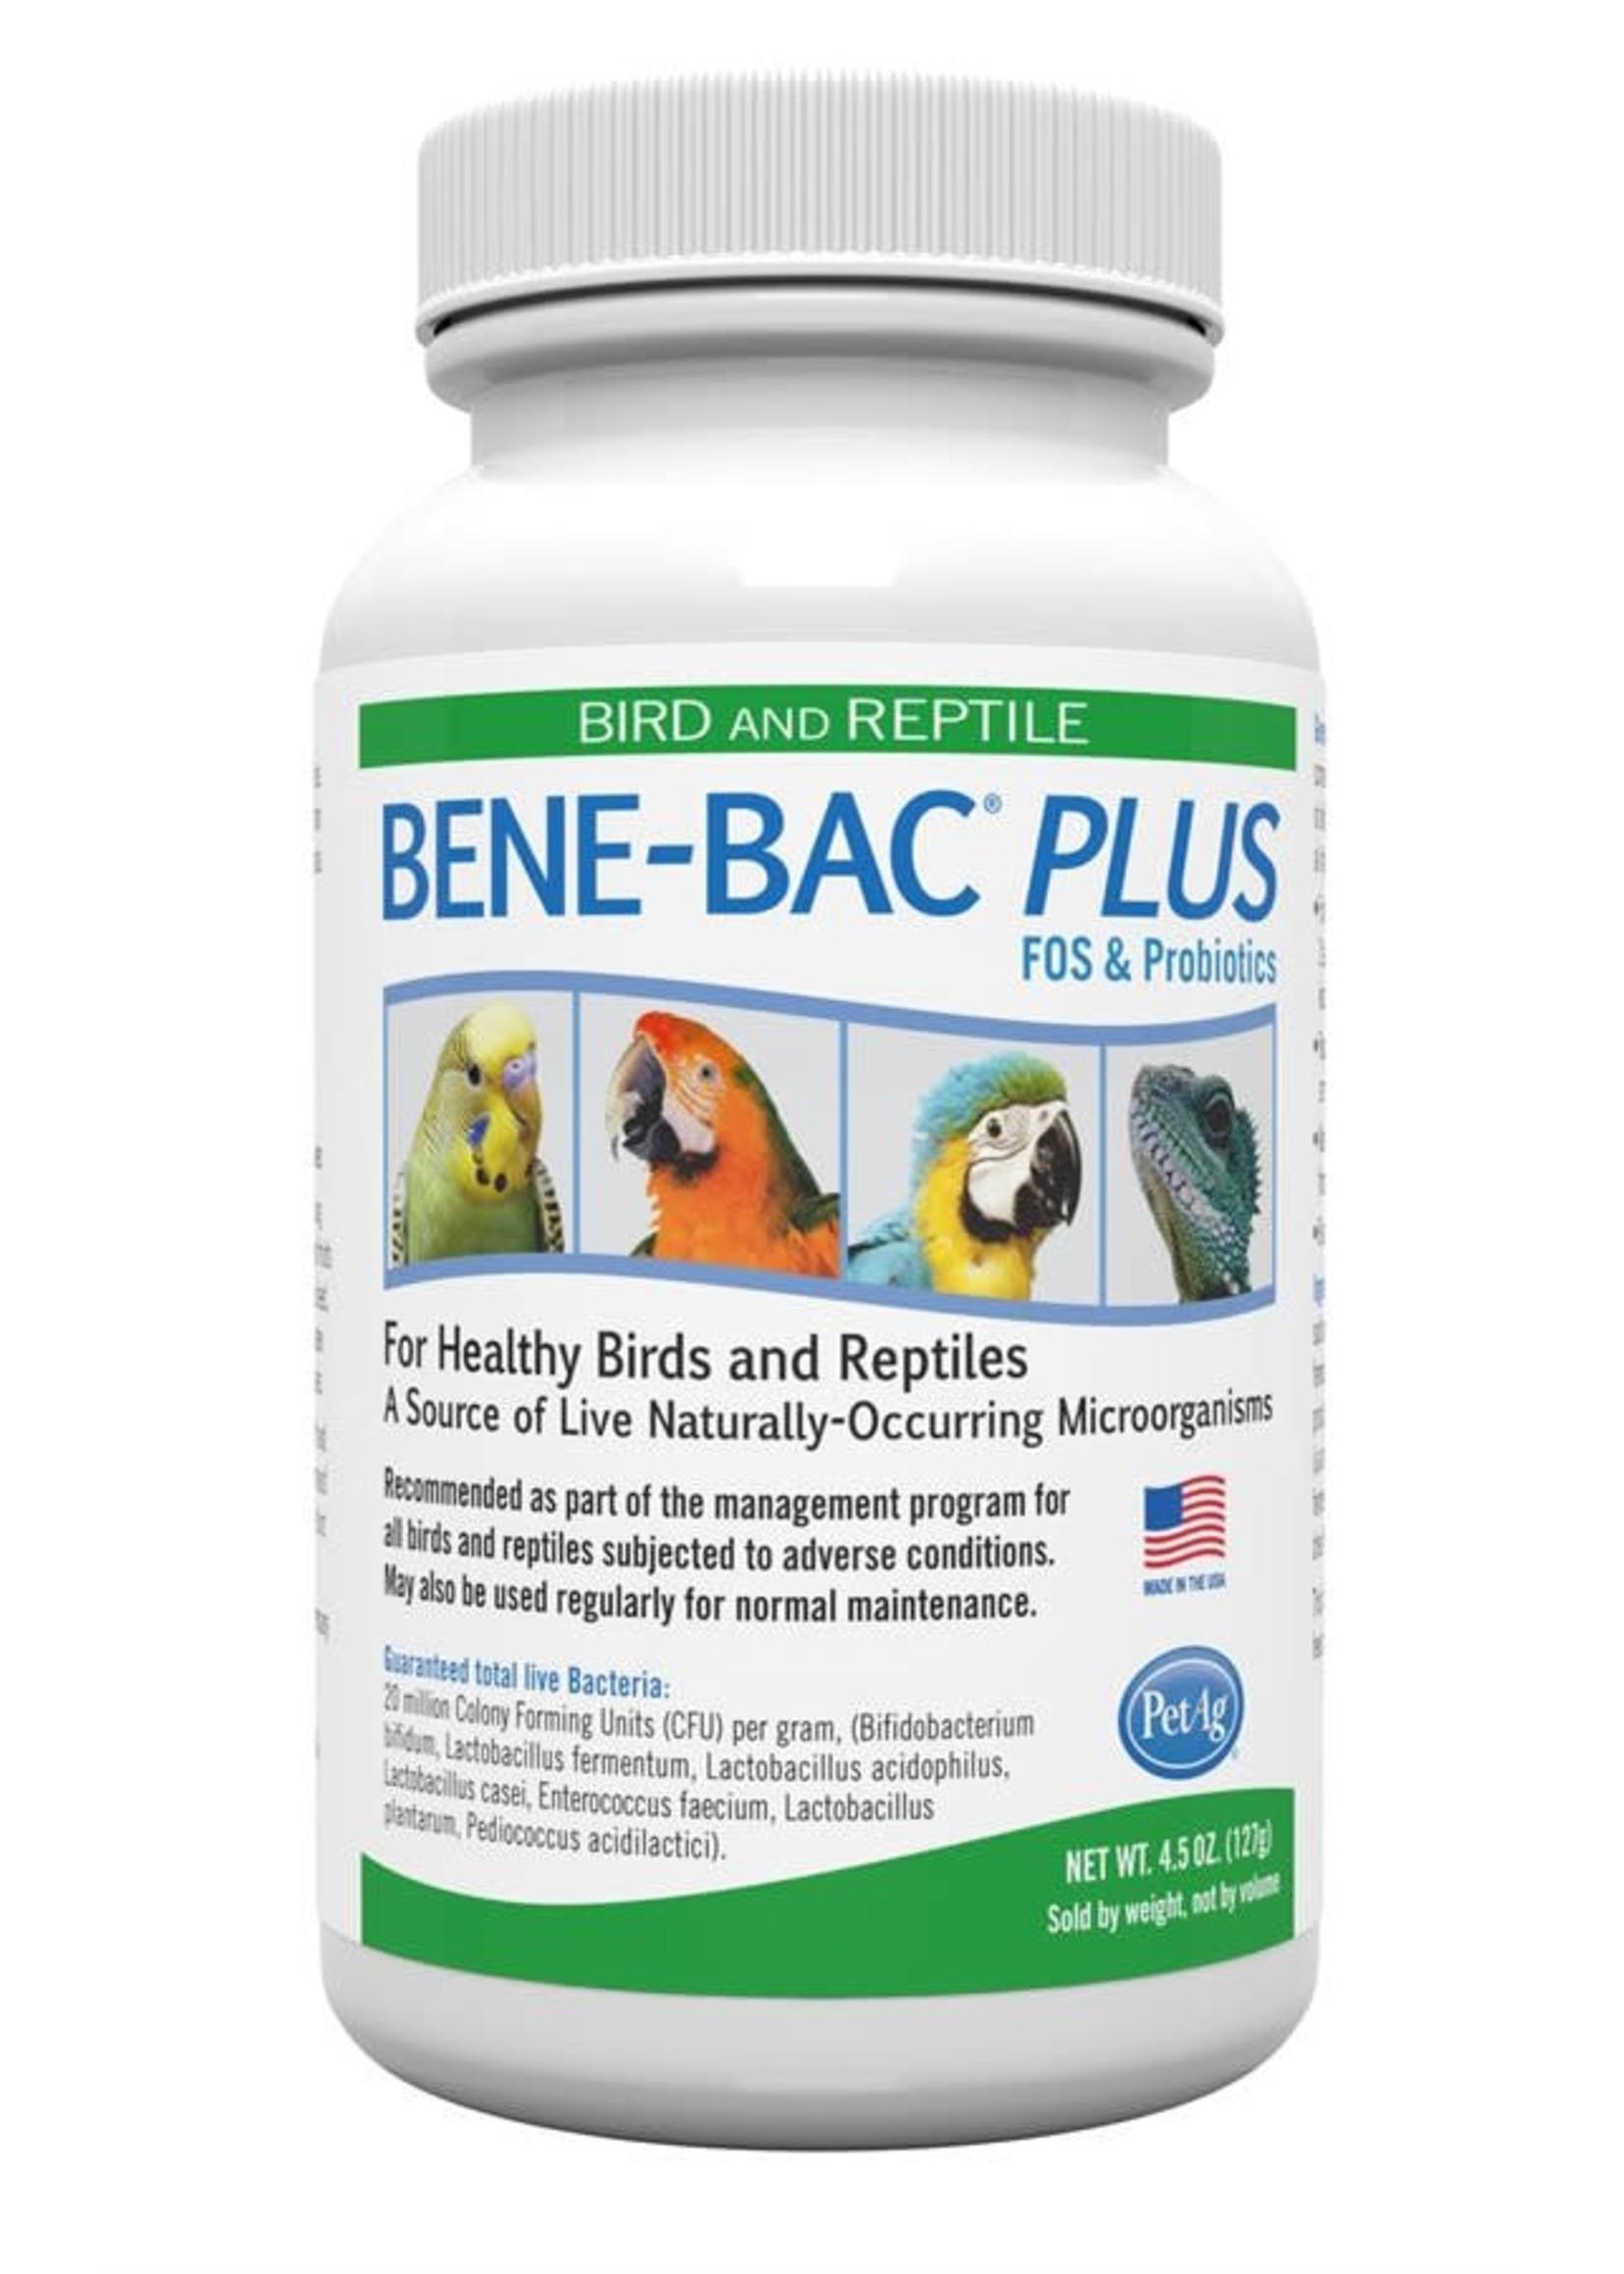 PetAg® PetAg Bird & Reptile Bene-Bac™ Plus Probiotic Powder 4.5oz